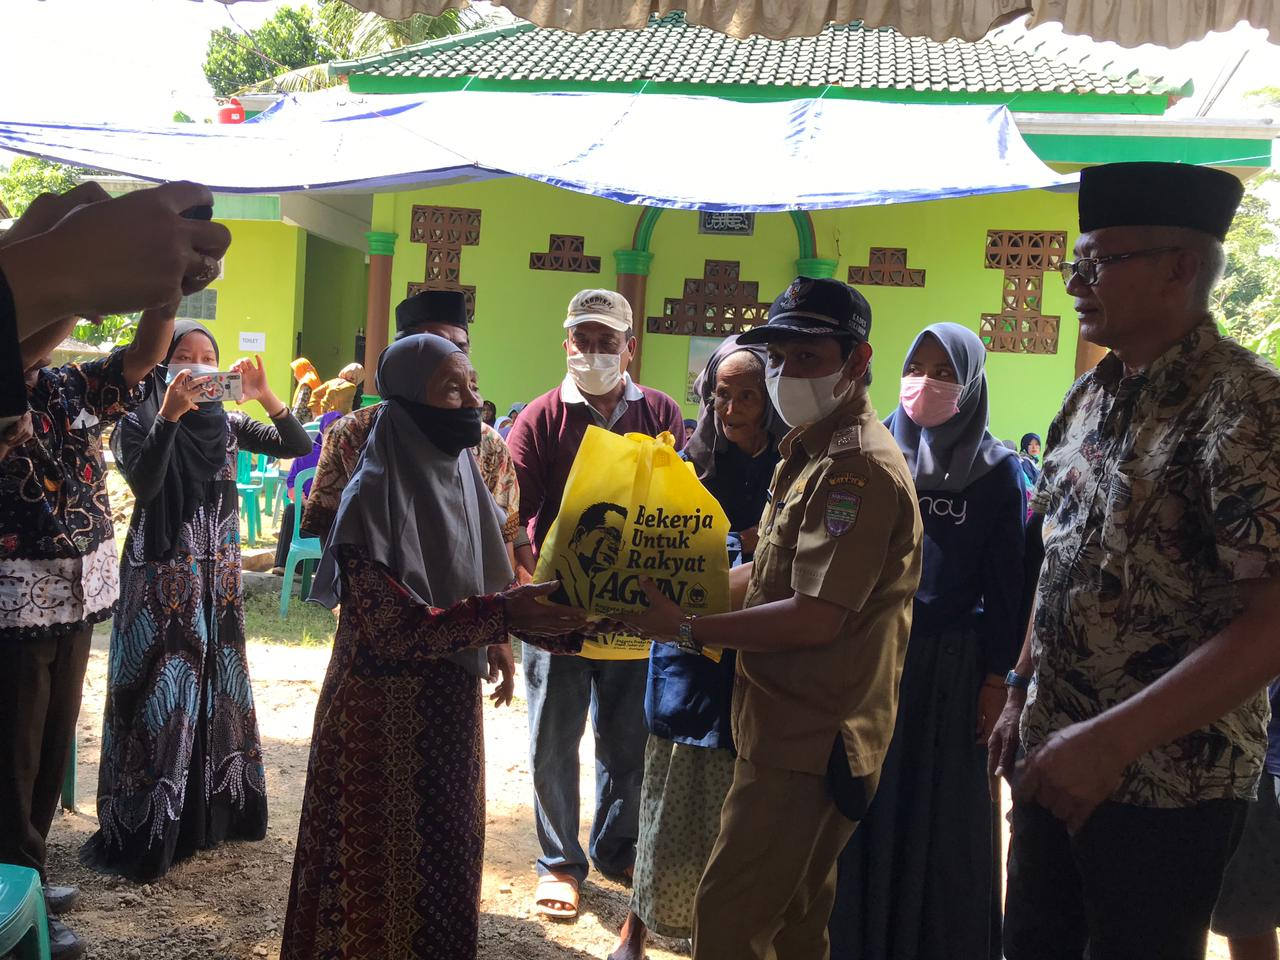 Kunjungi Pabrik Sale di Pamarican, Agun Gunandjar Minta Perbankan Pro Aktif Beri Permodalan UMKM